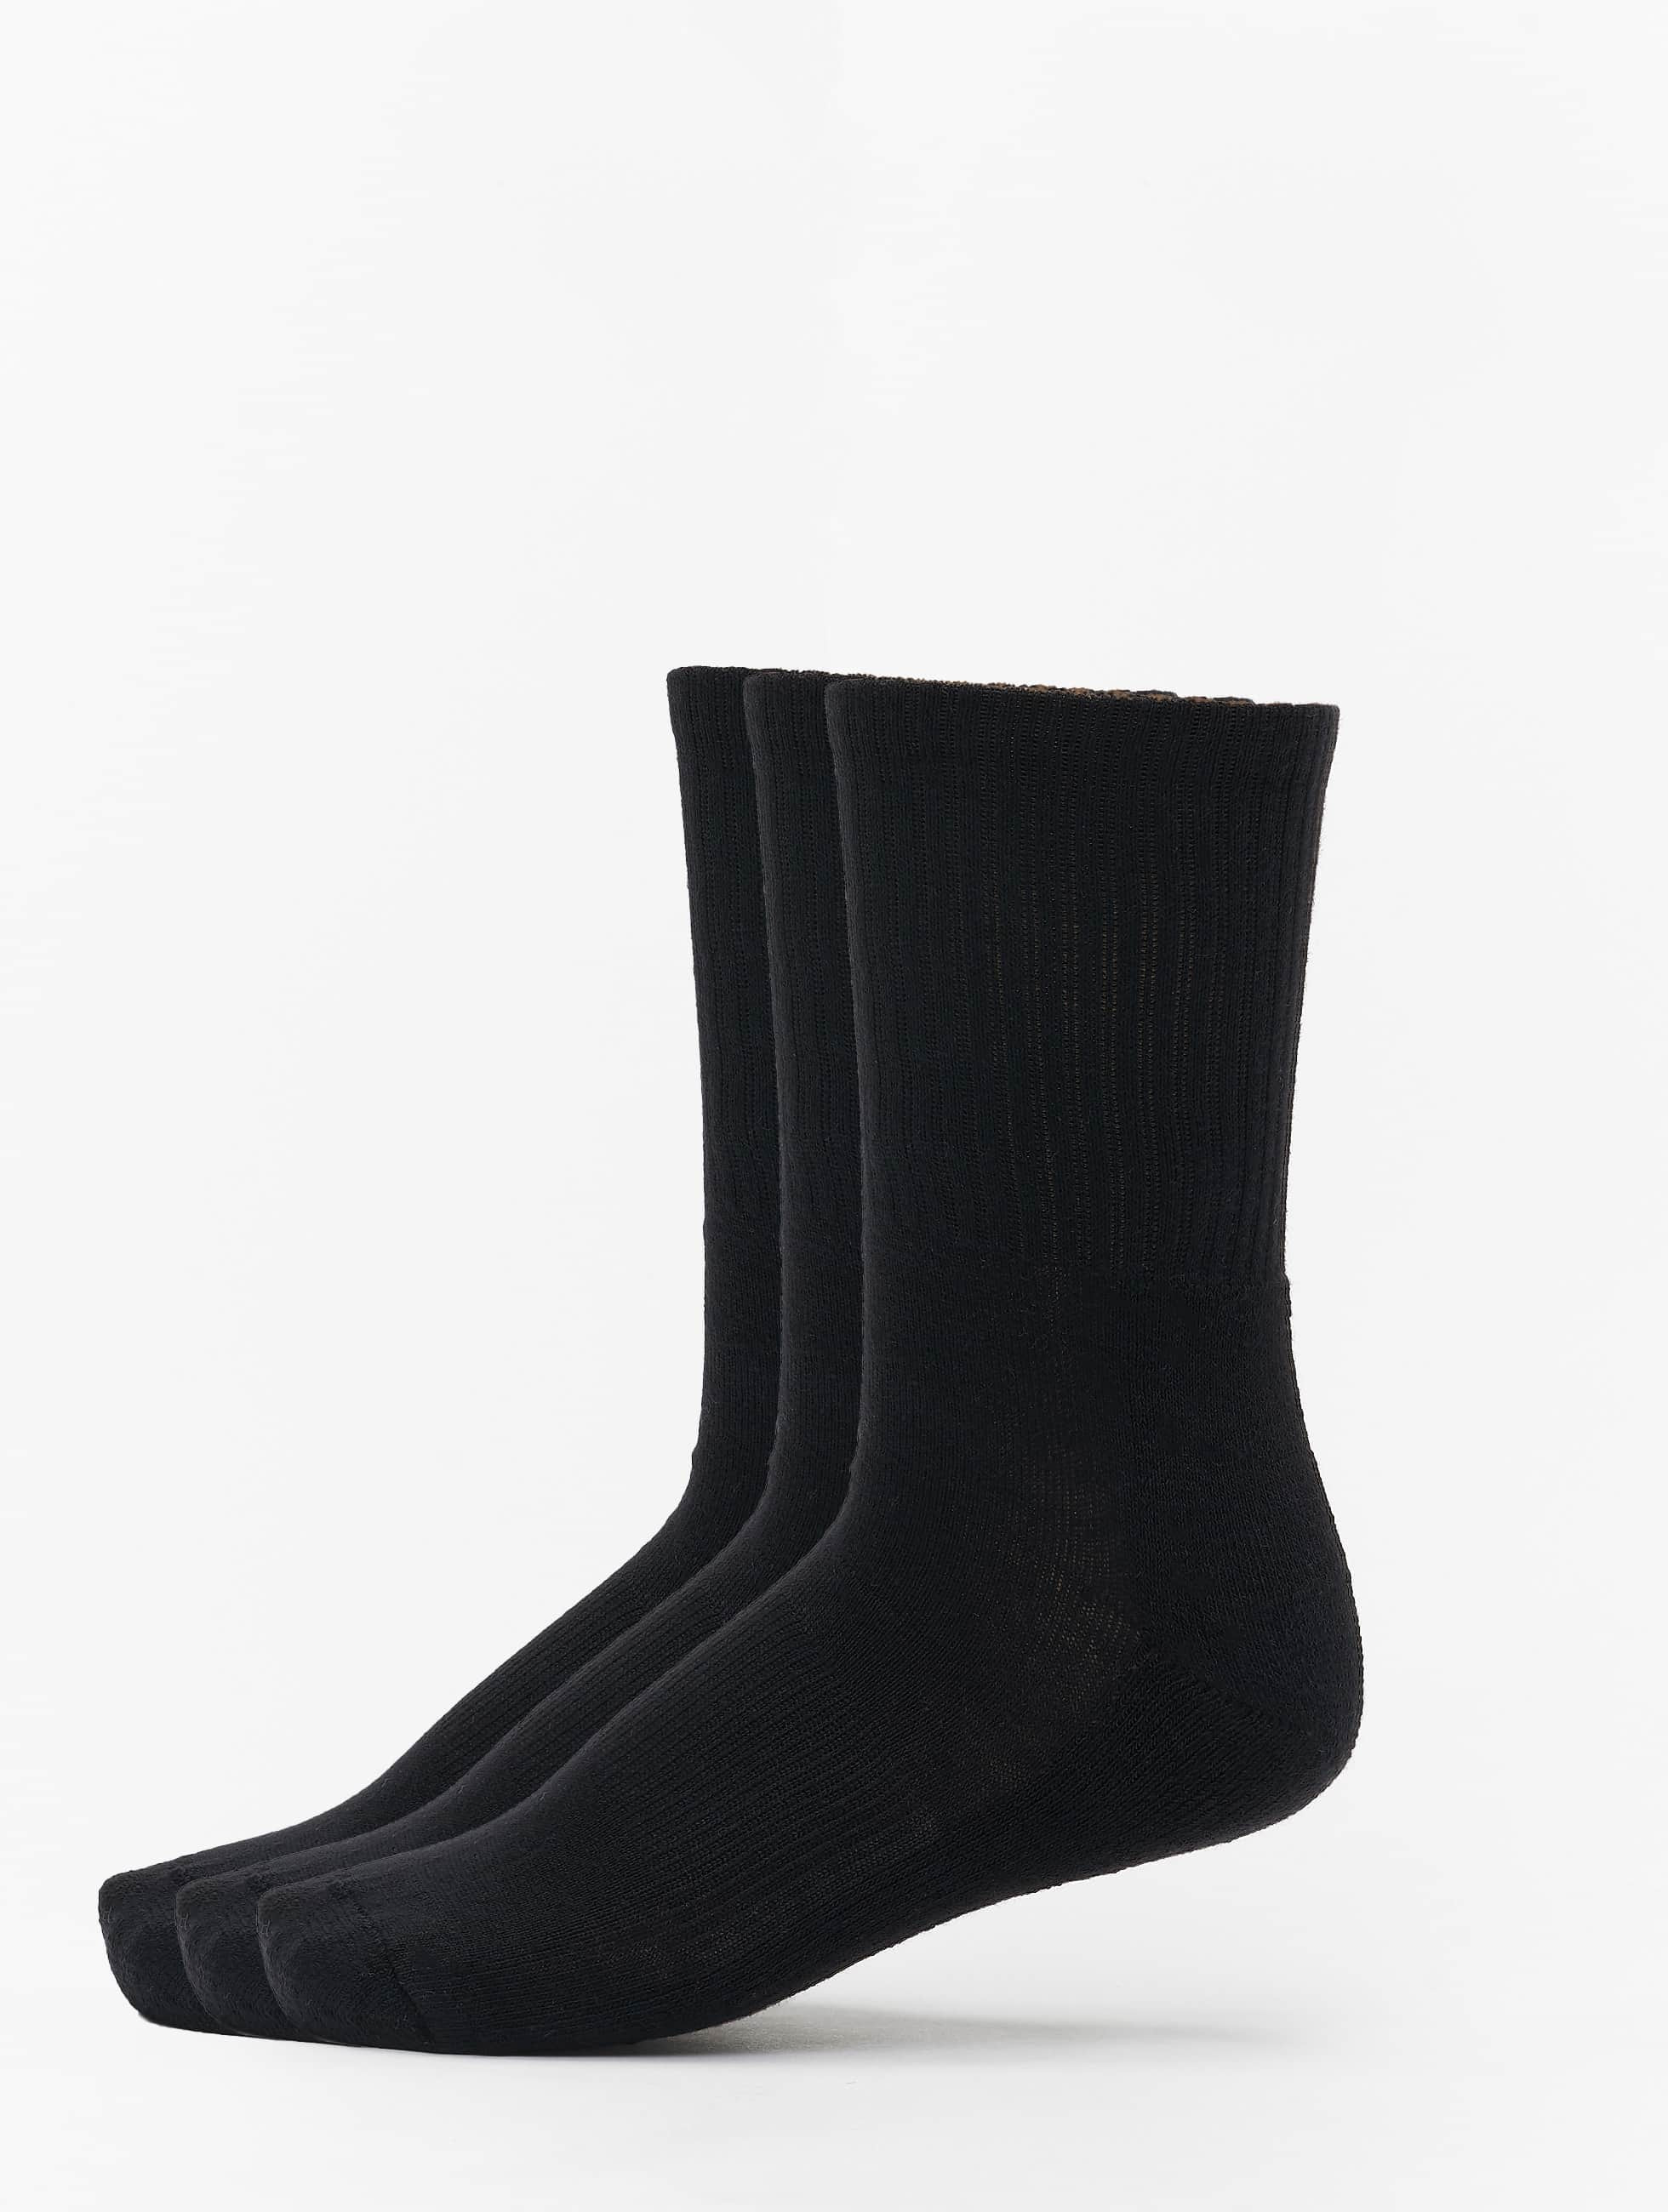 Urban Classics Männer,Frauen Socken 3-Pack Sport in schwarz